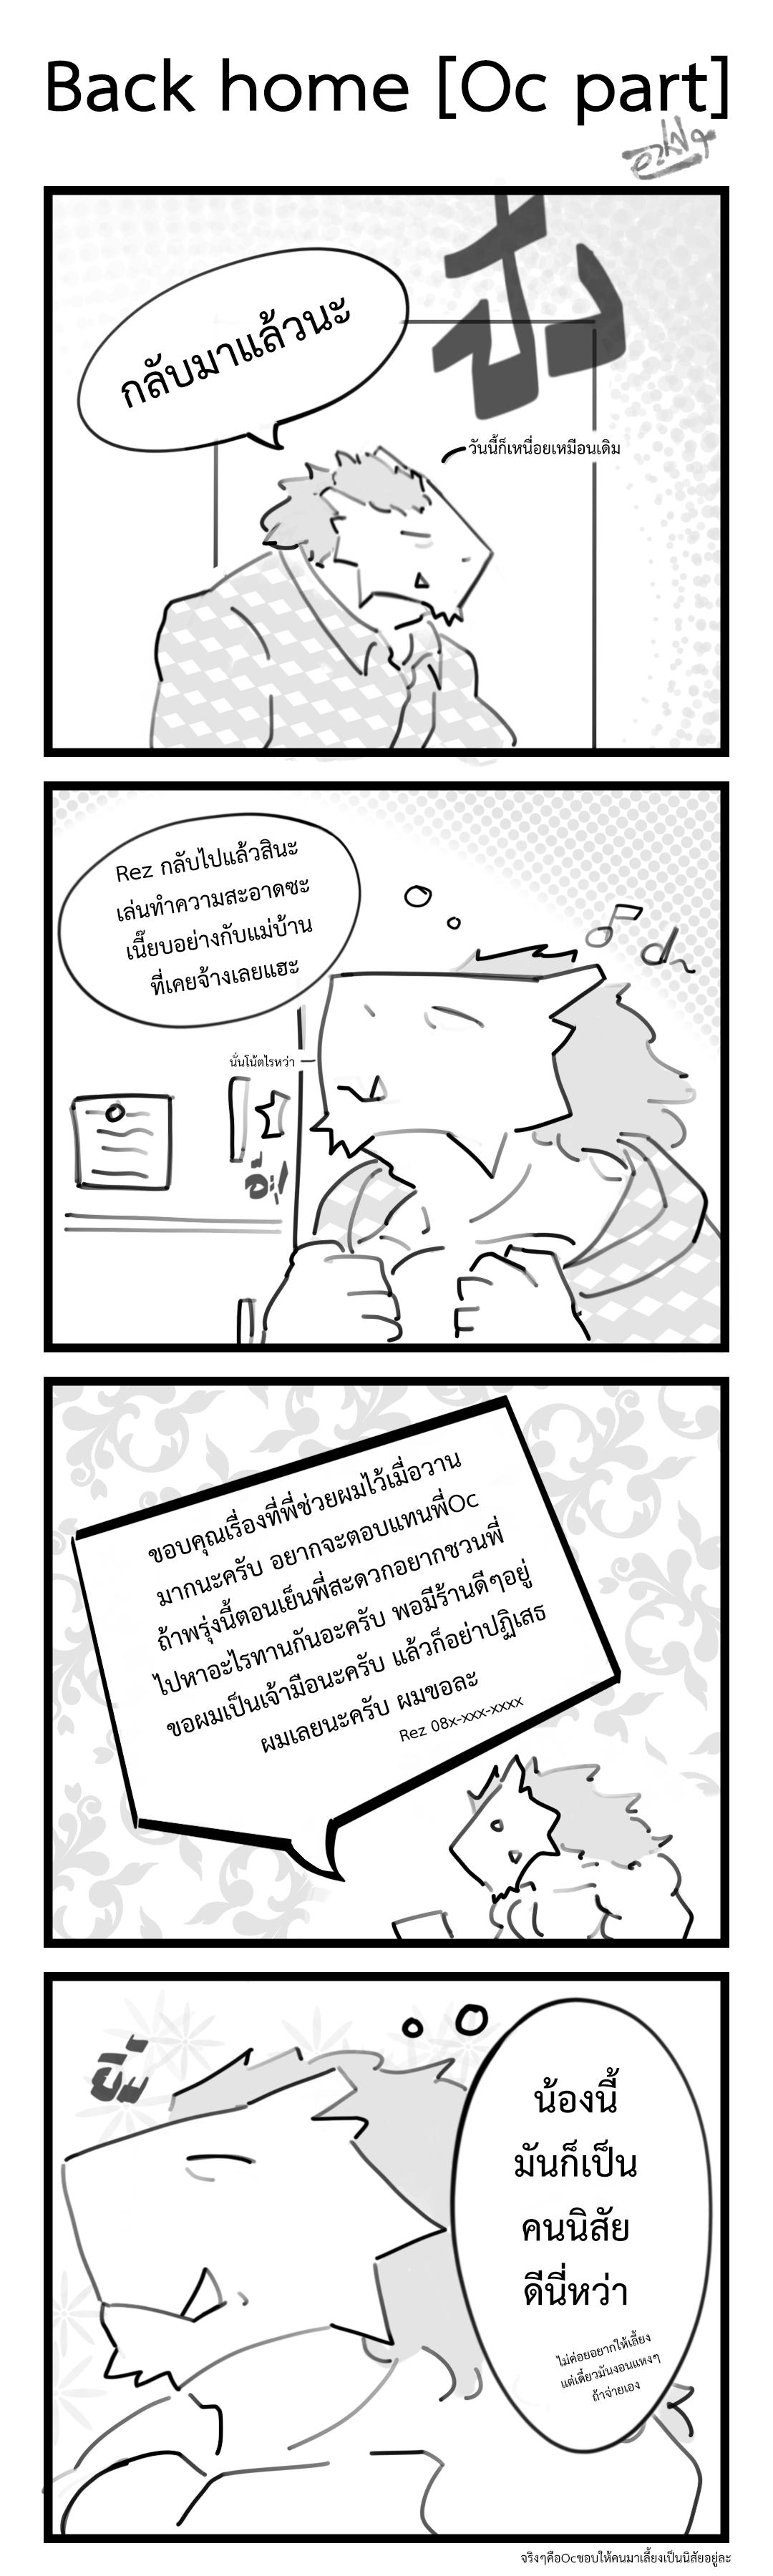 17 - Back home [Oc part]